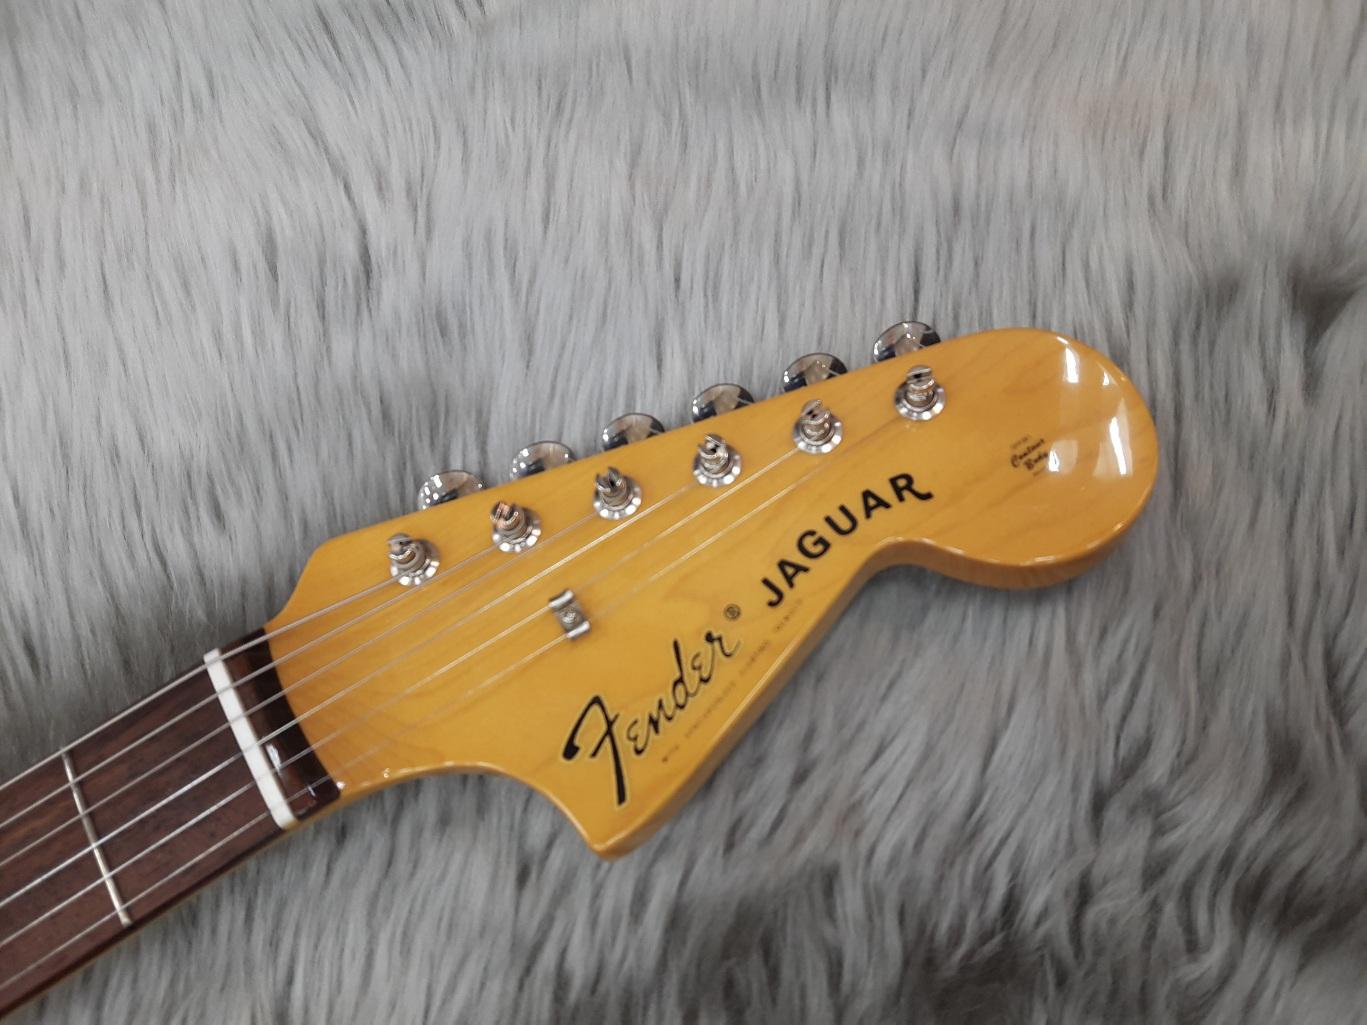 Japan Exclusive Classic 60S Jaguarのヘッド画像